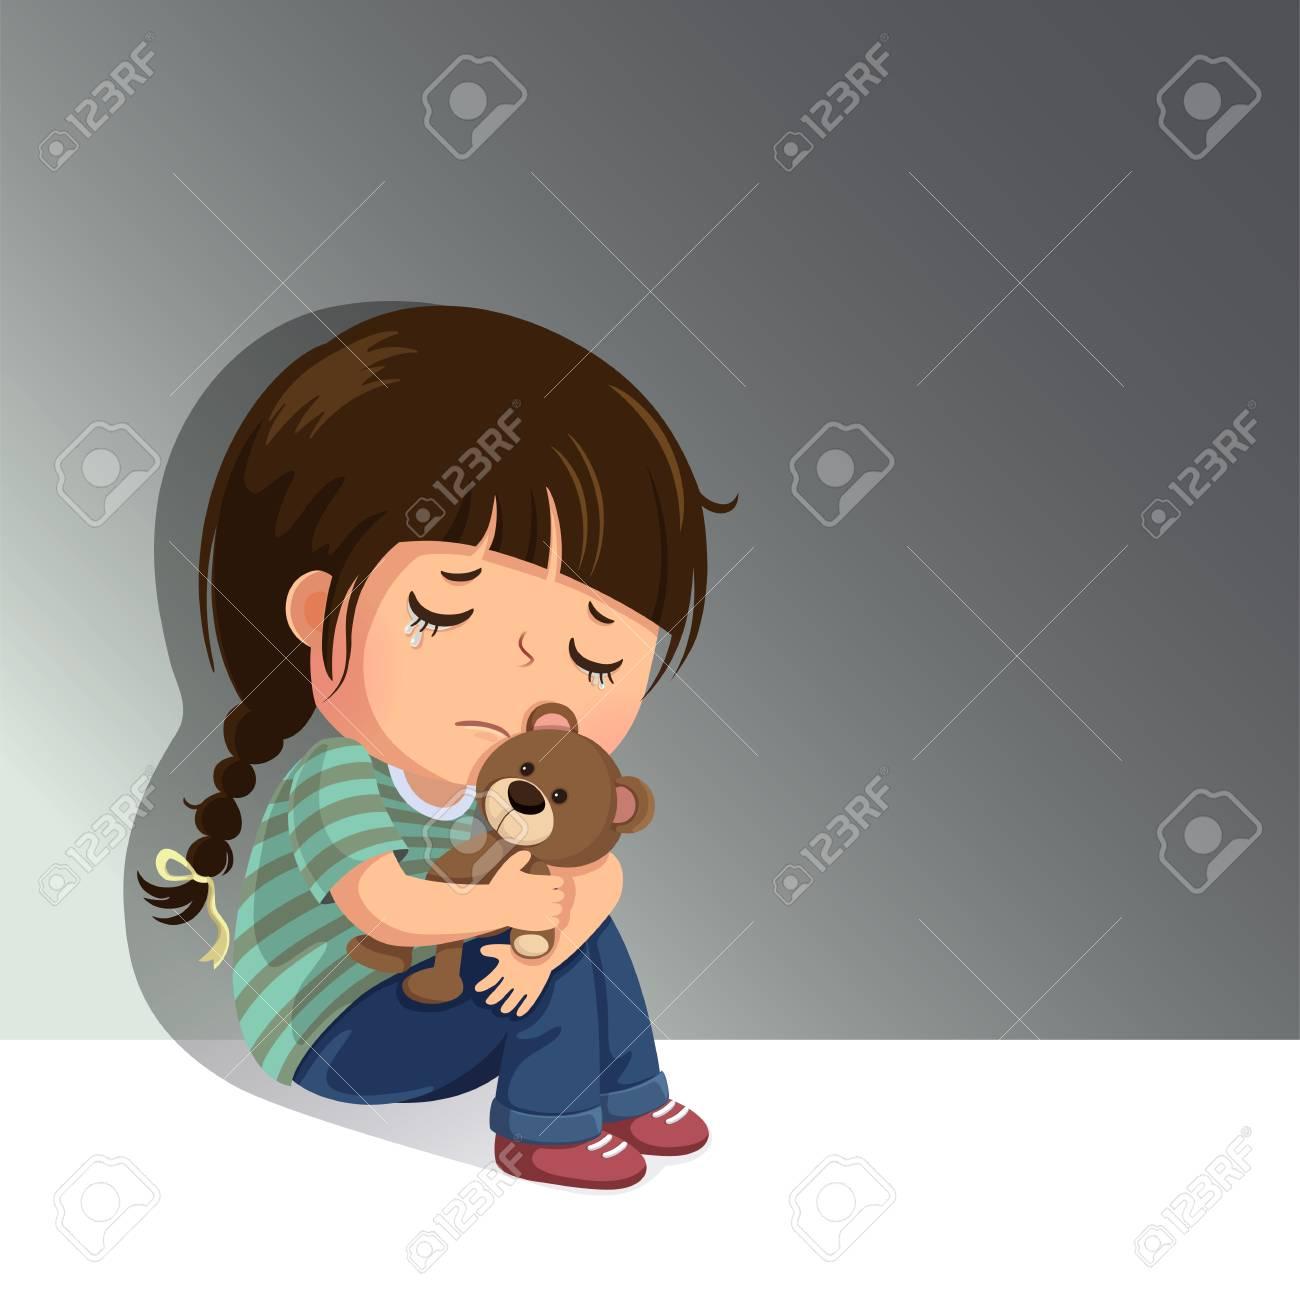 Alone Cartoon Girl sad little girl sitting alone with her teddy bear